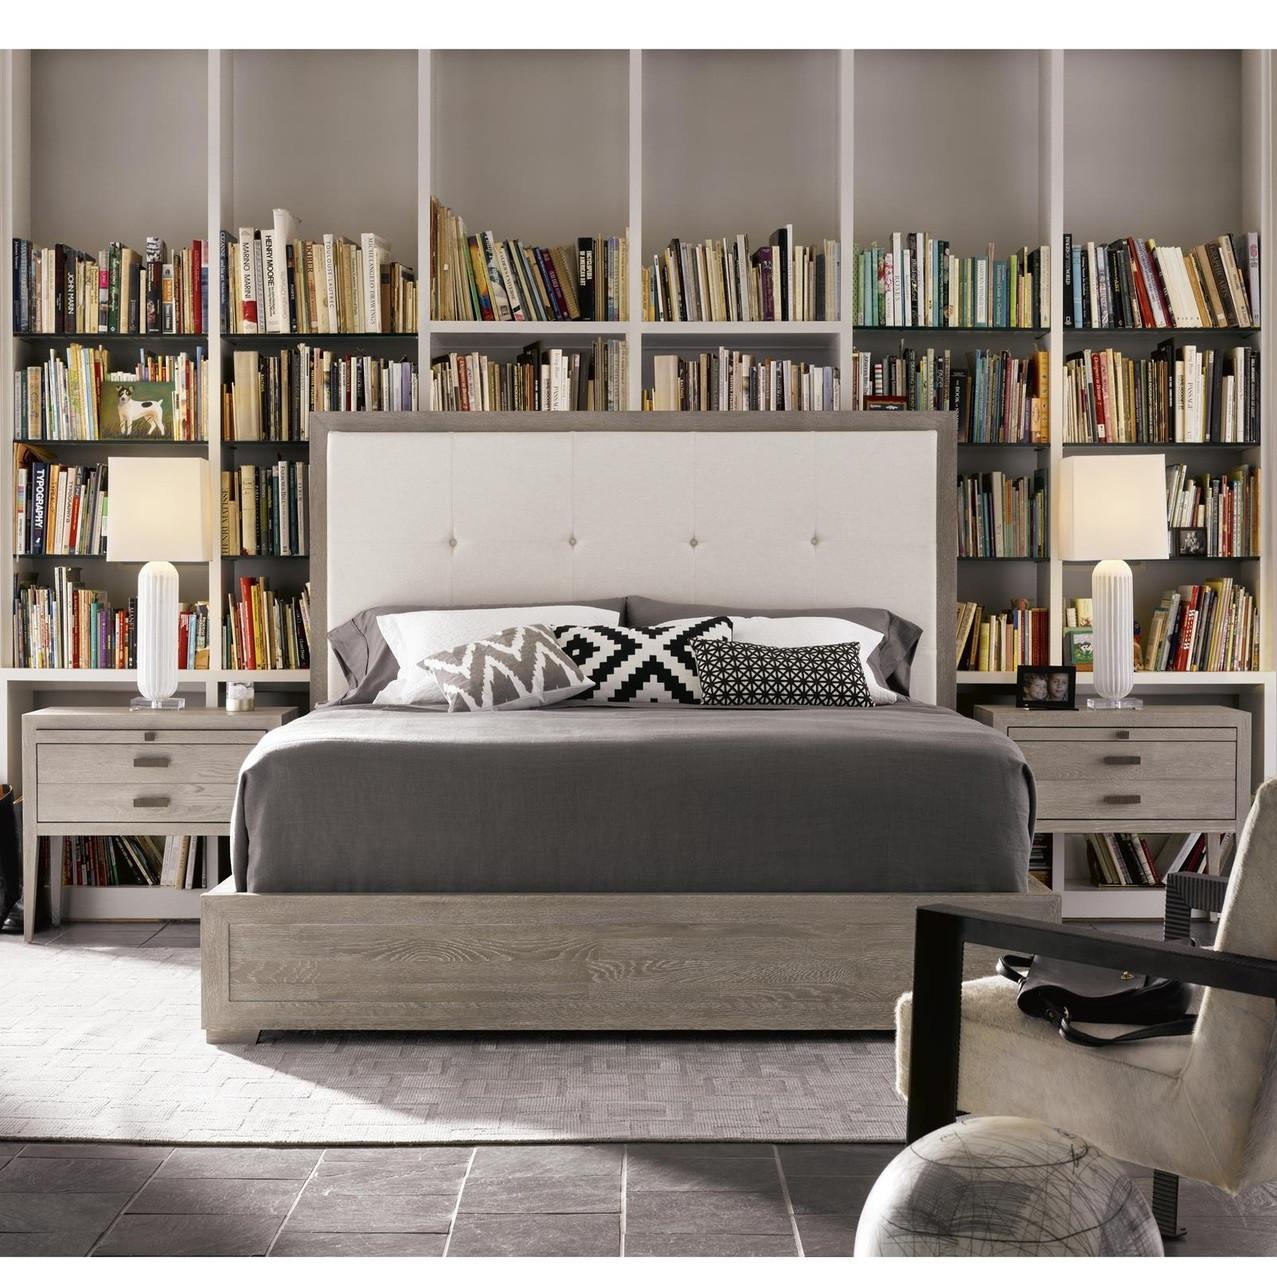 Queen platform bed with headboard - Nolan Modern Grey Oak Tufted Headboard Queen Platform Bed